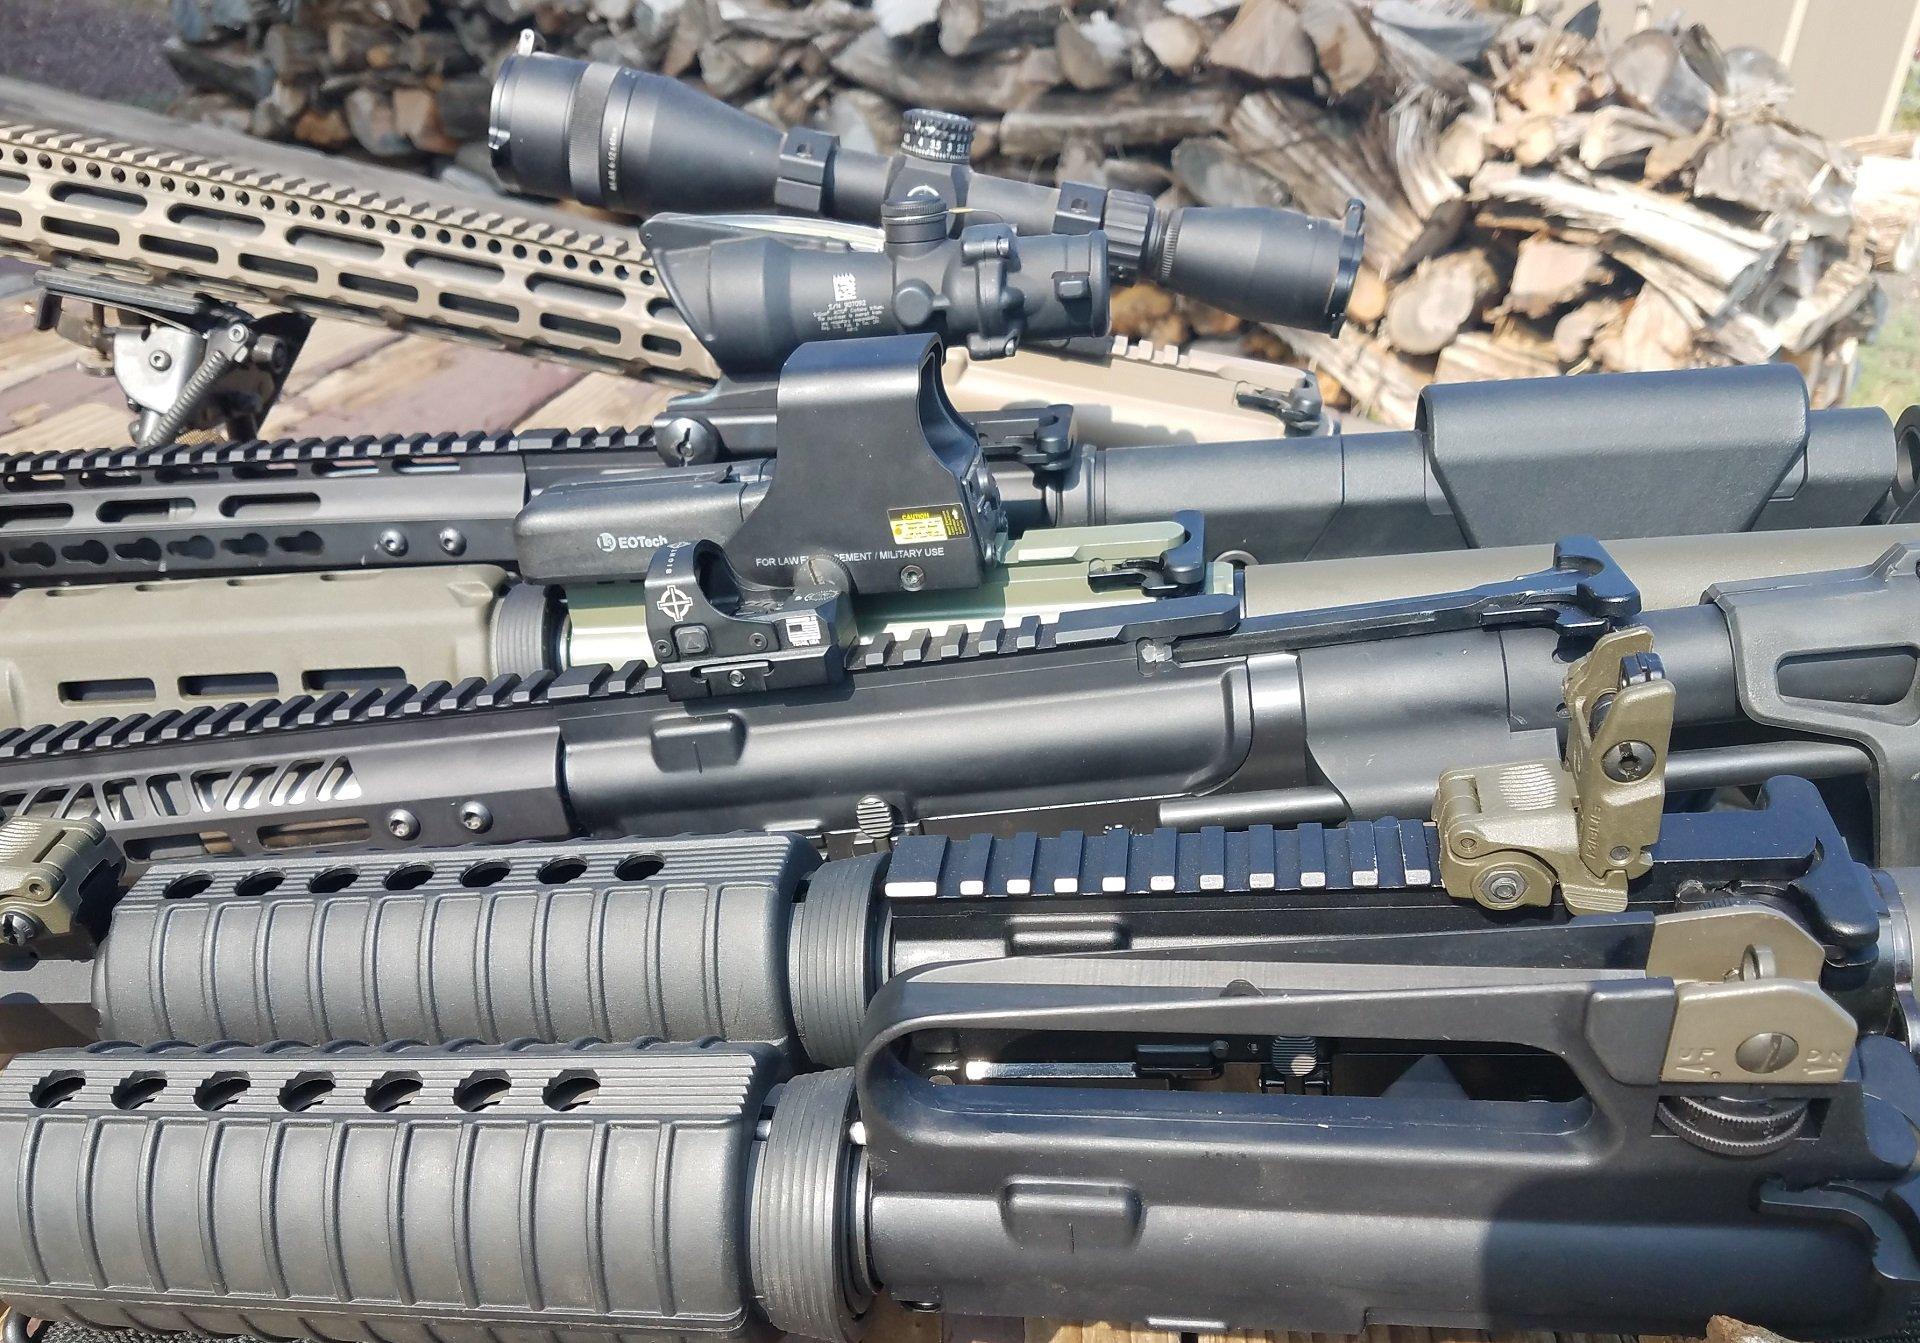 AR15 sights